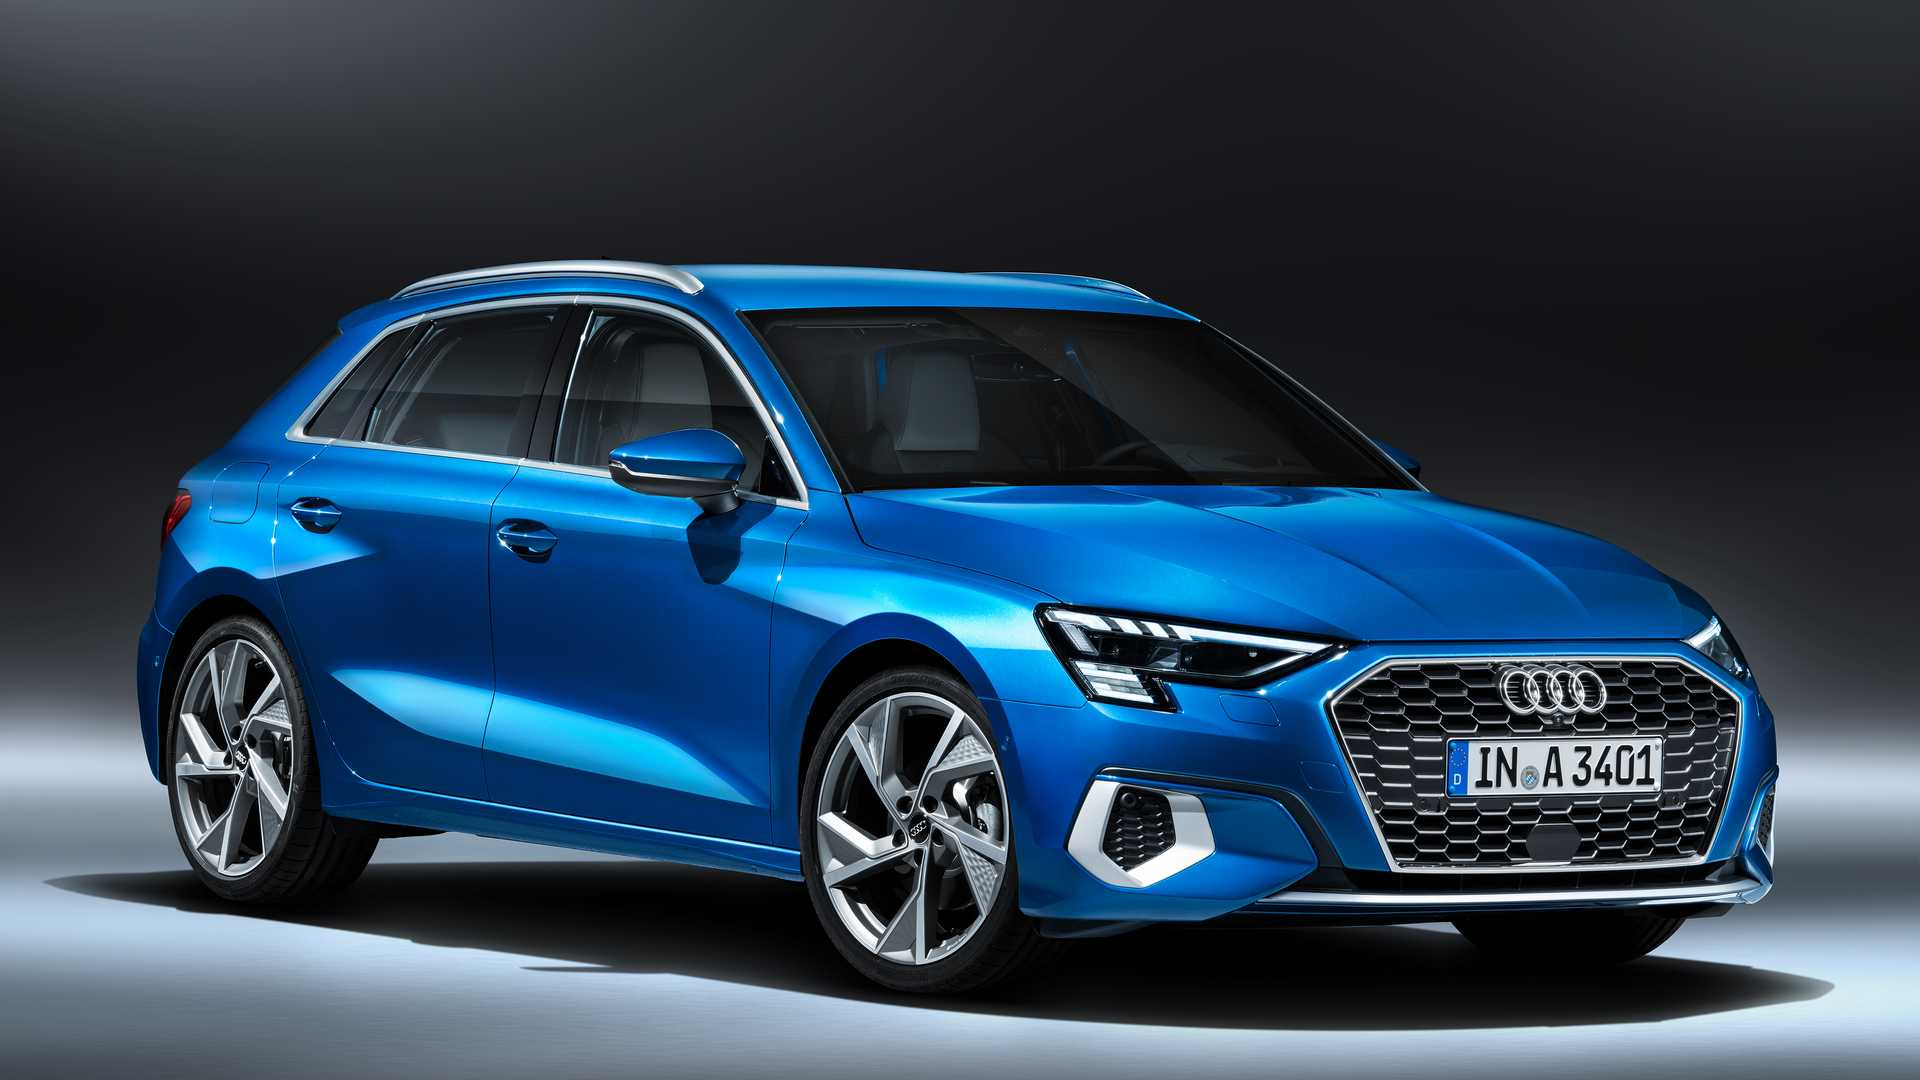 Audi A3 Sportback Terbaru Semakin Modern dengan Jok Limbah Botol Plastik